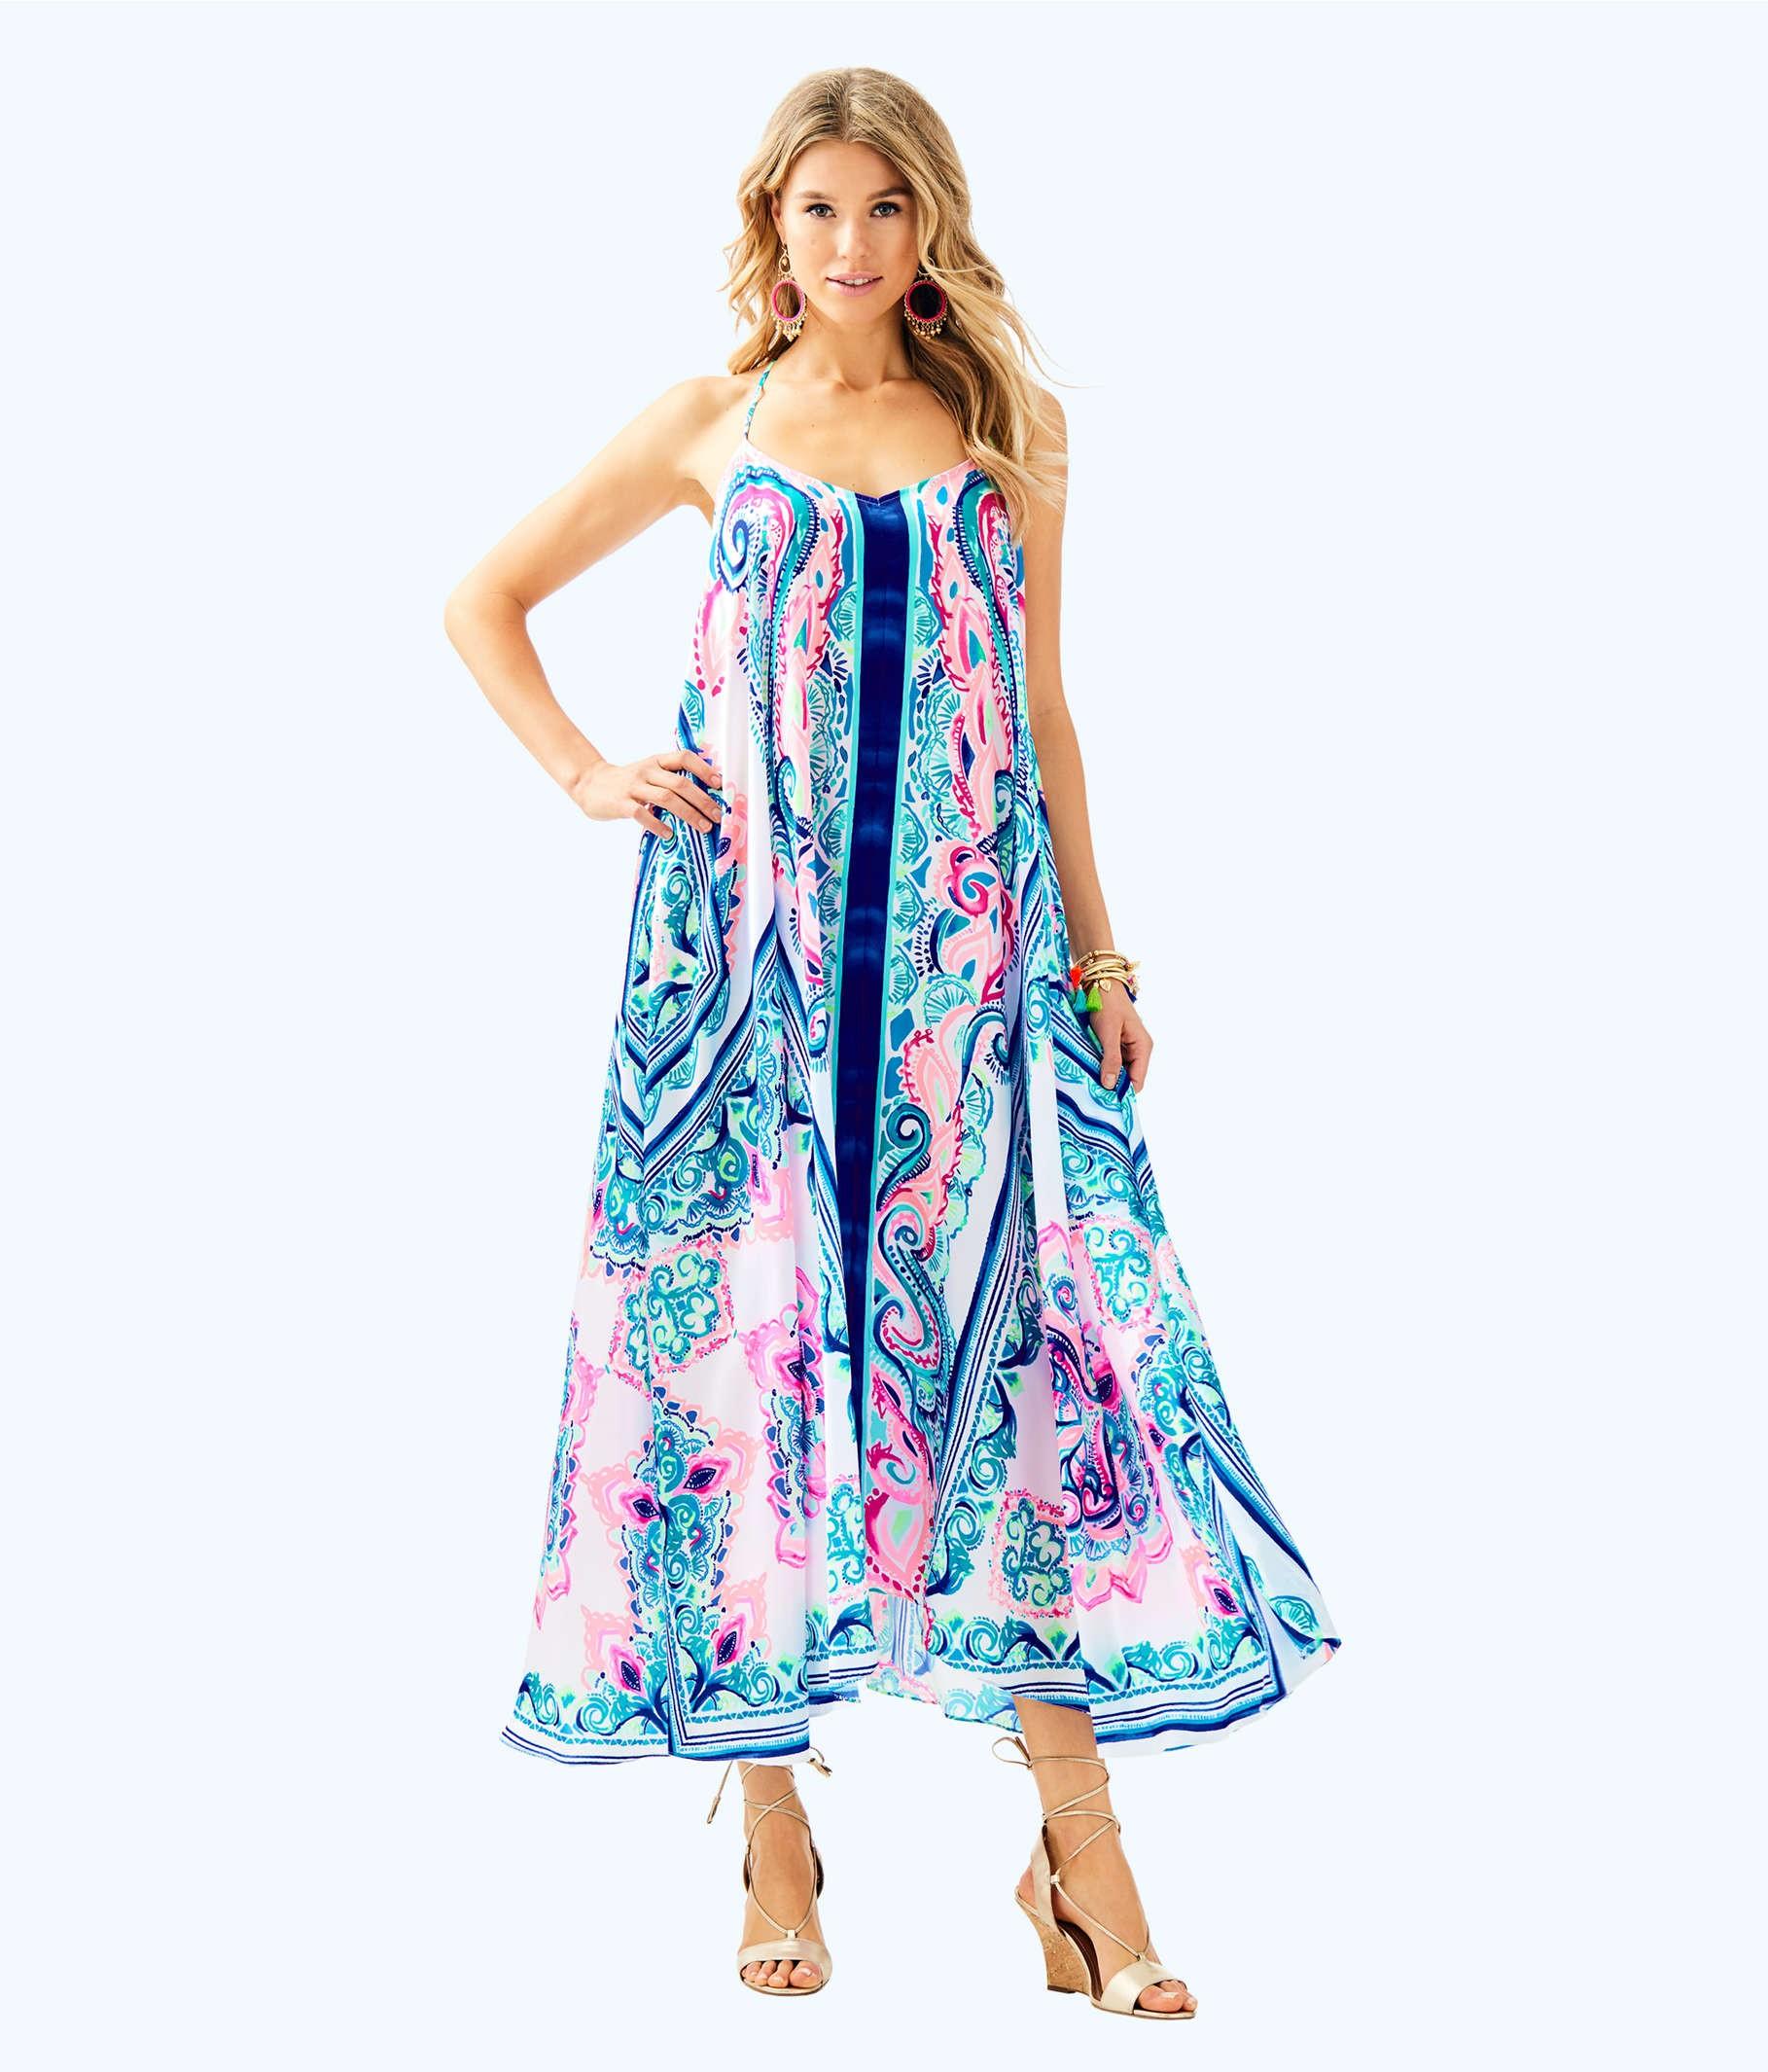 30 Week Bumpdate + Lilly Pulitzer Maxi Dress - CLASSY SASSY